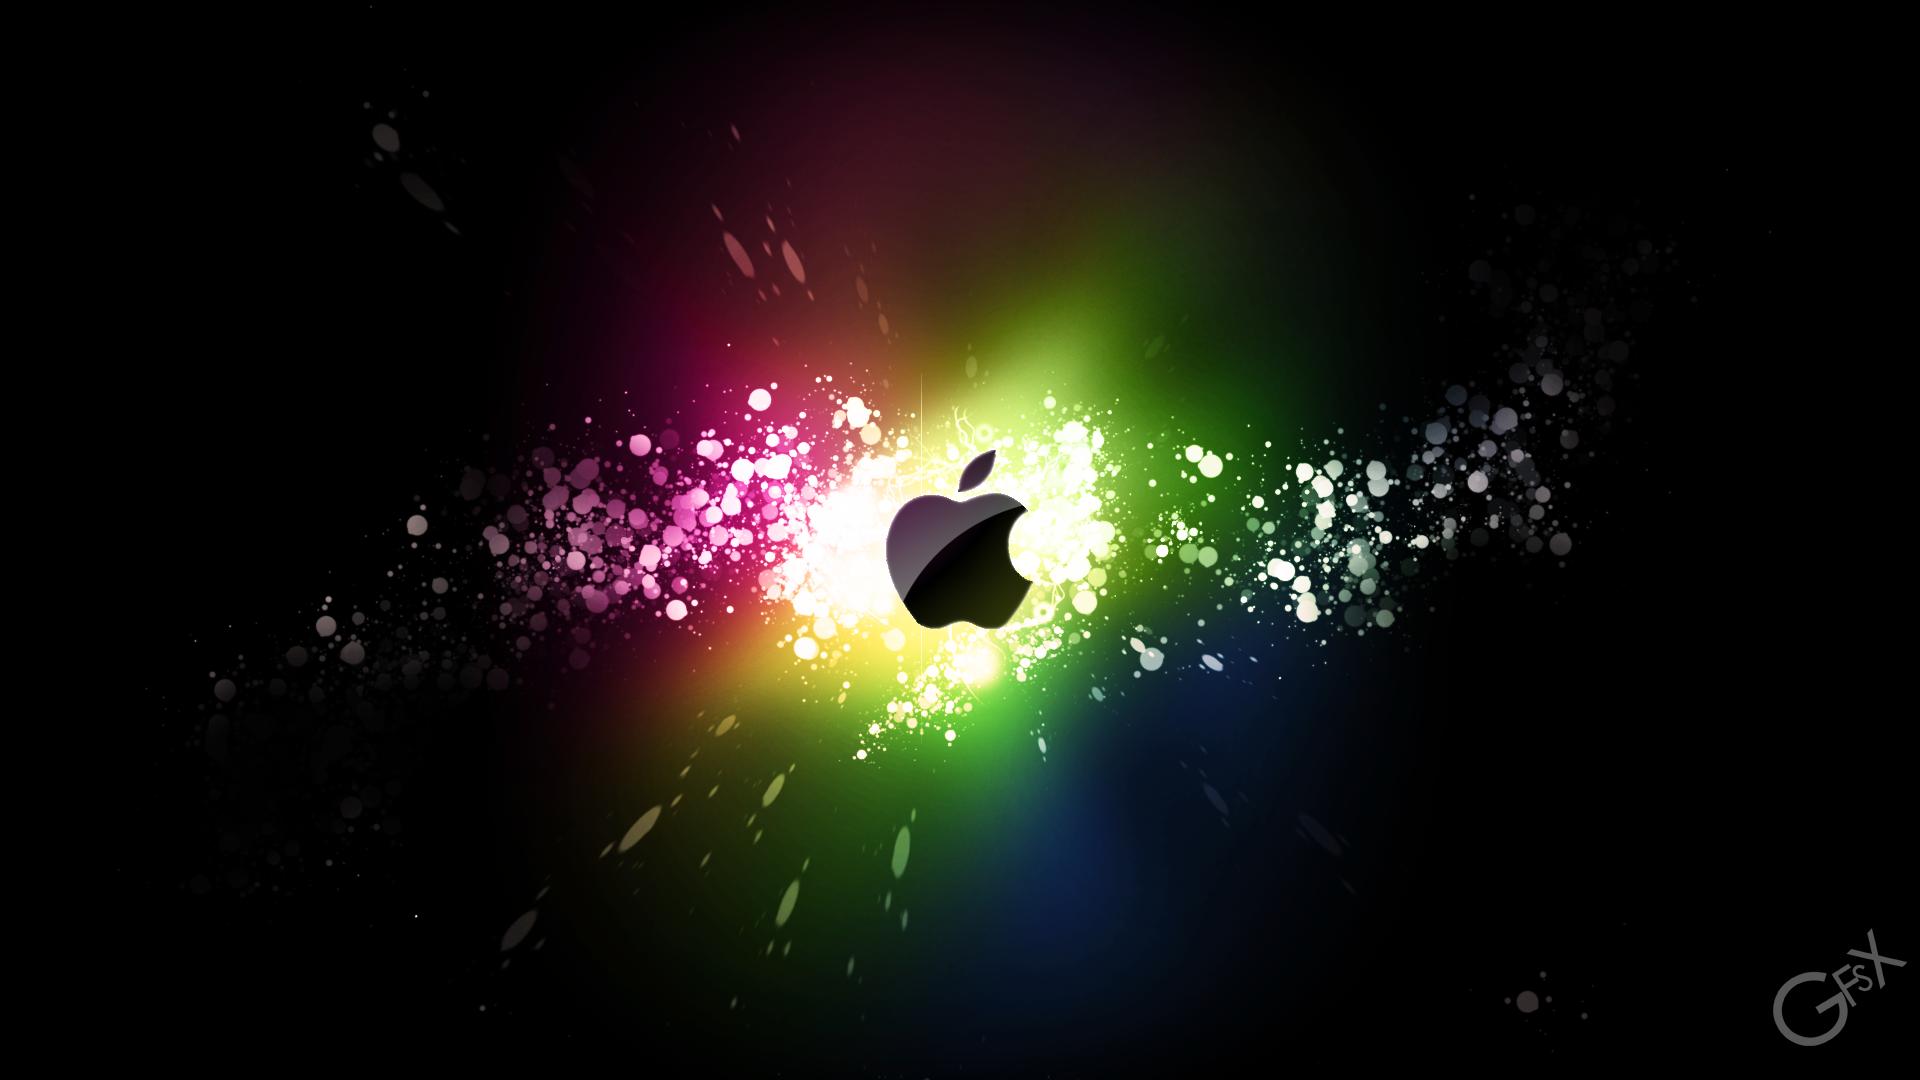 50 Inspiring Apple Mac iPad Wallpapers For Download 1920x1080